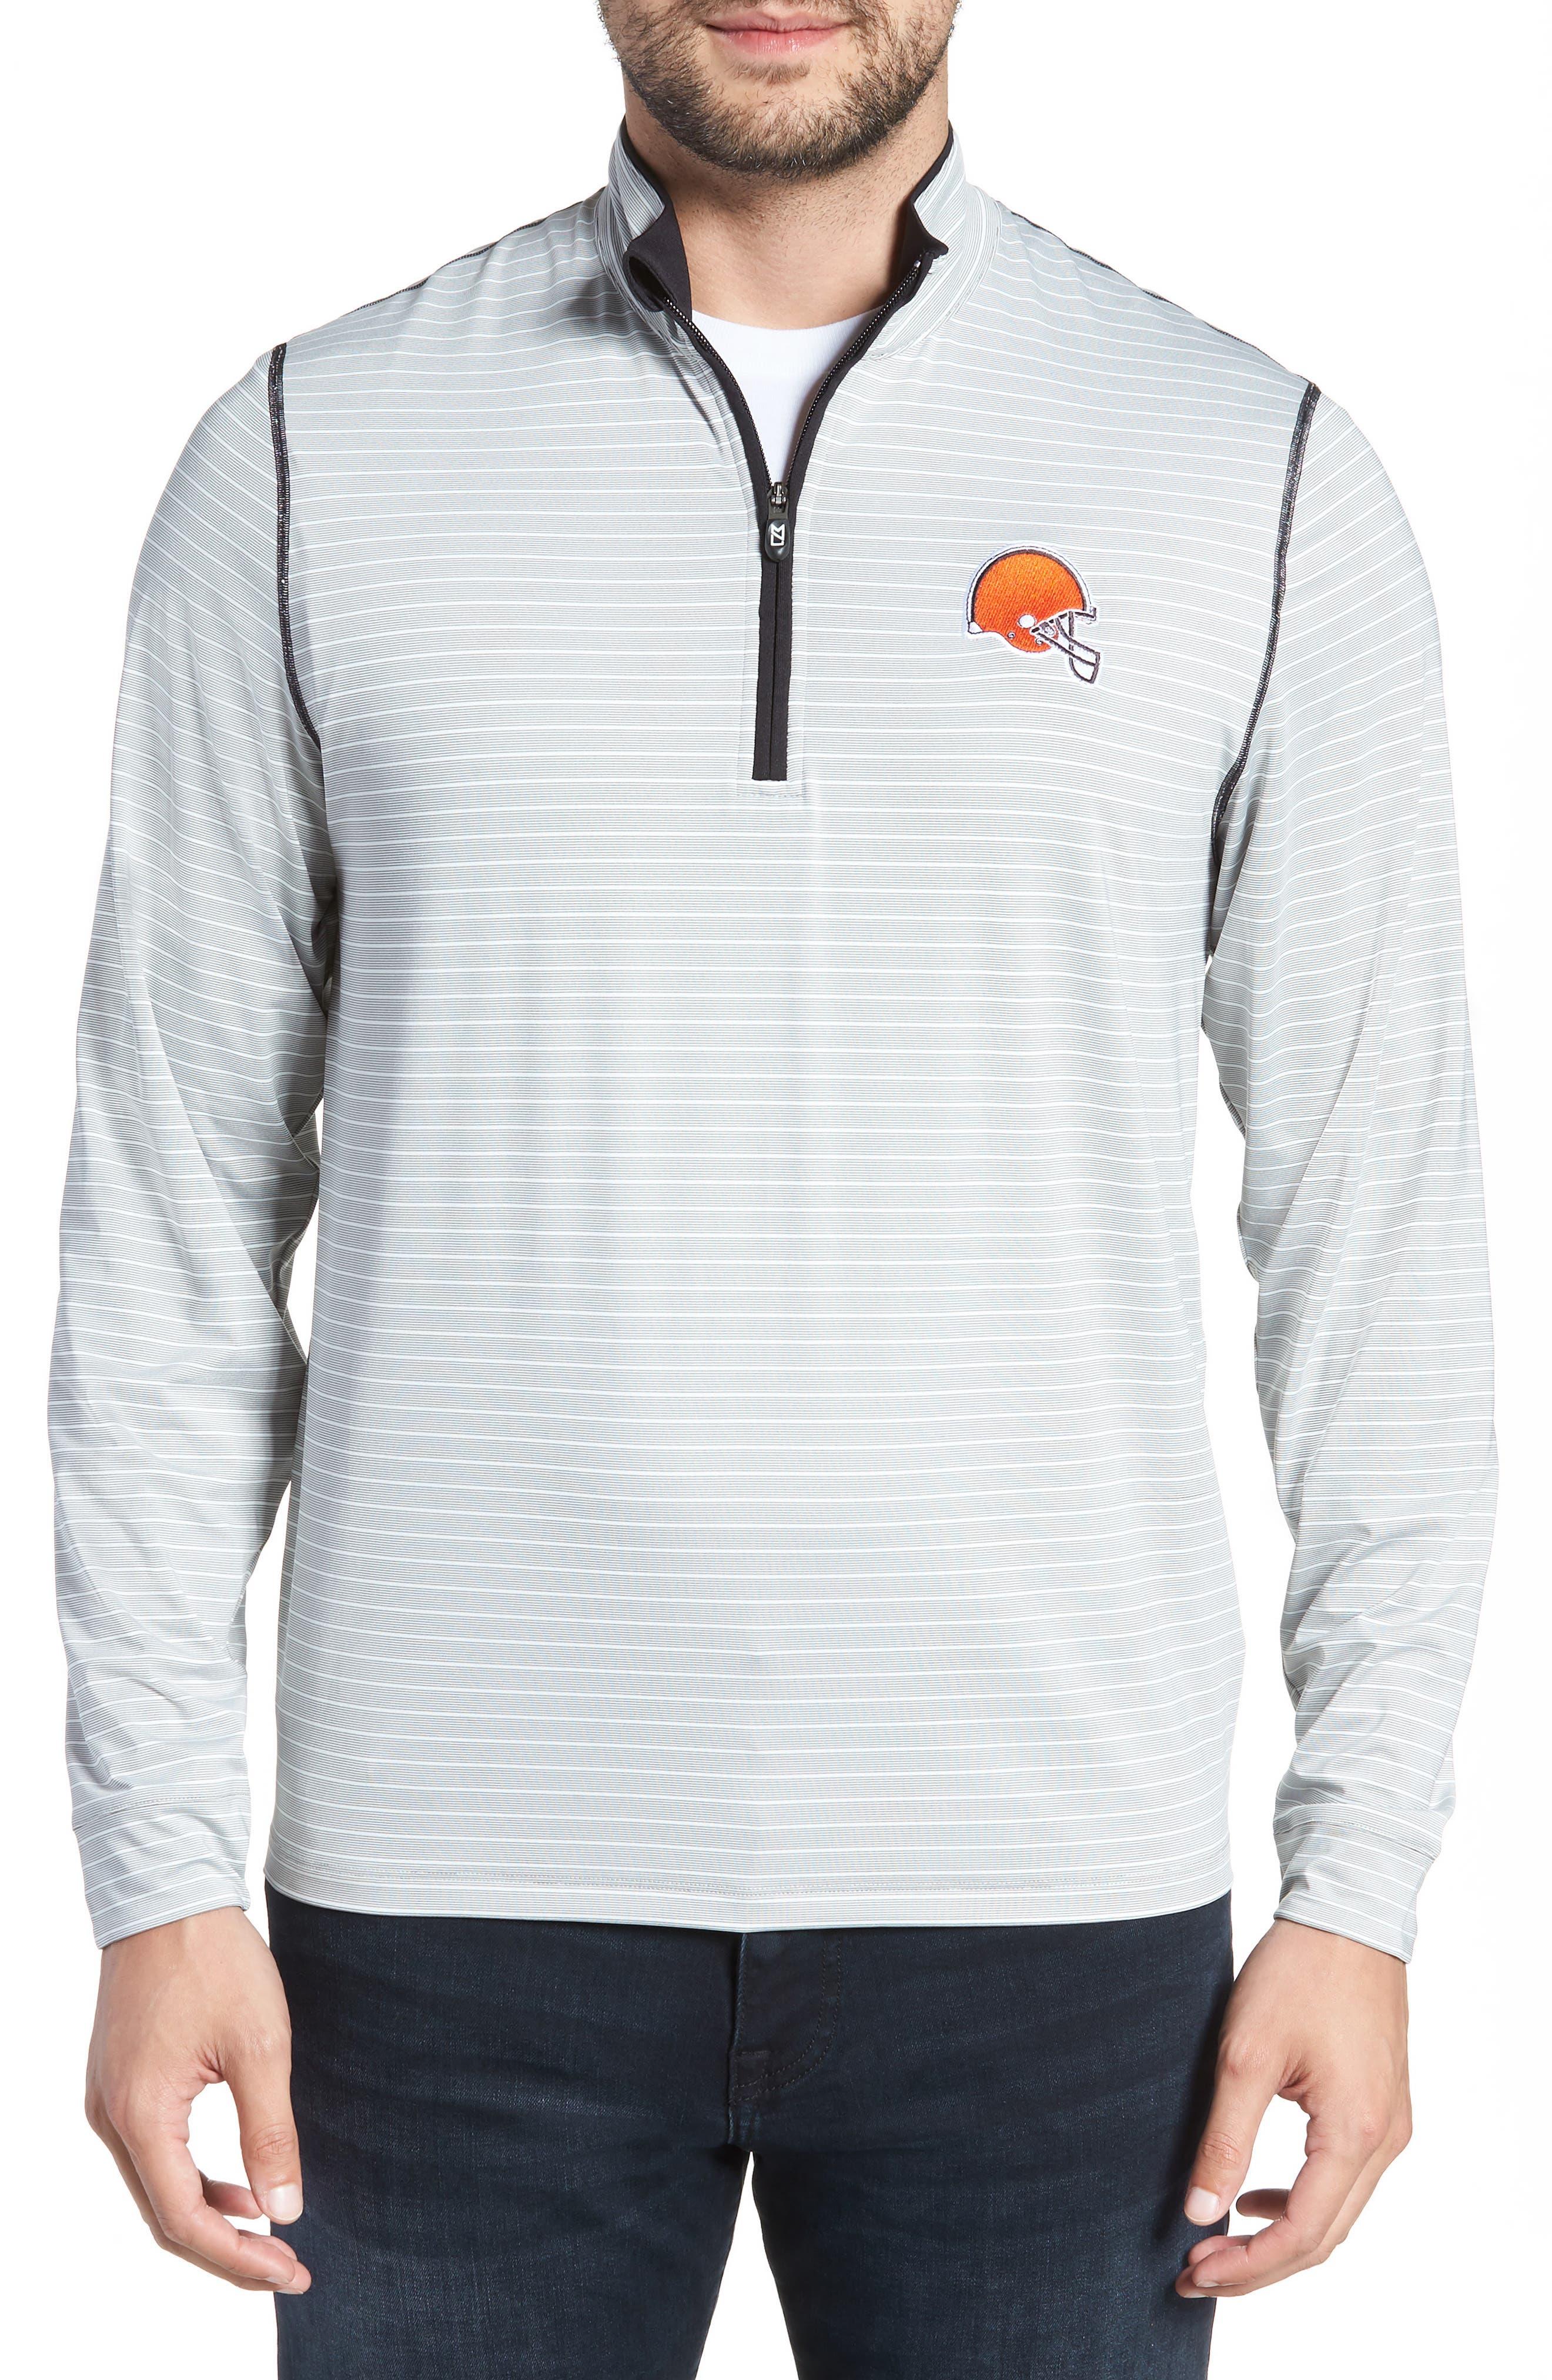 Meridian - Cleveland Browns Regular Fit Half Zip Pullover,                             Main thumbnail 1, color,                             BLACK